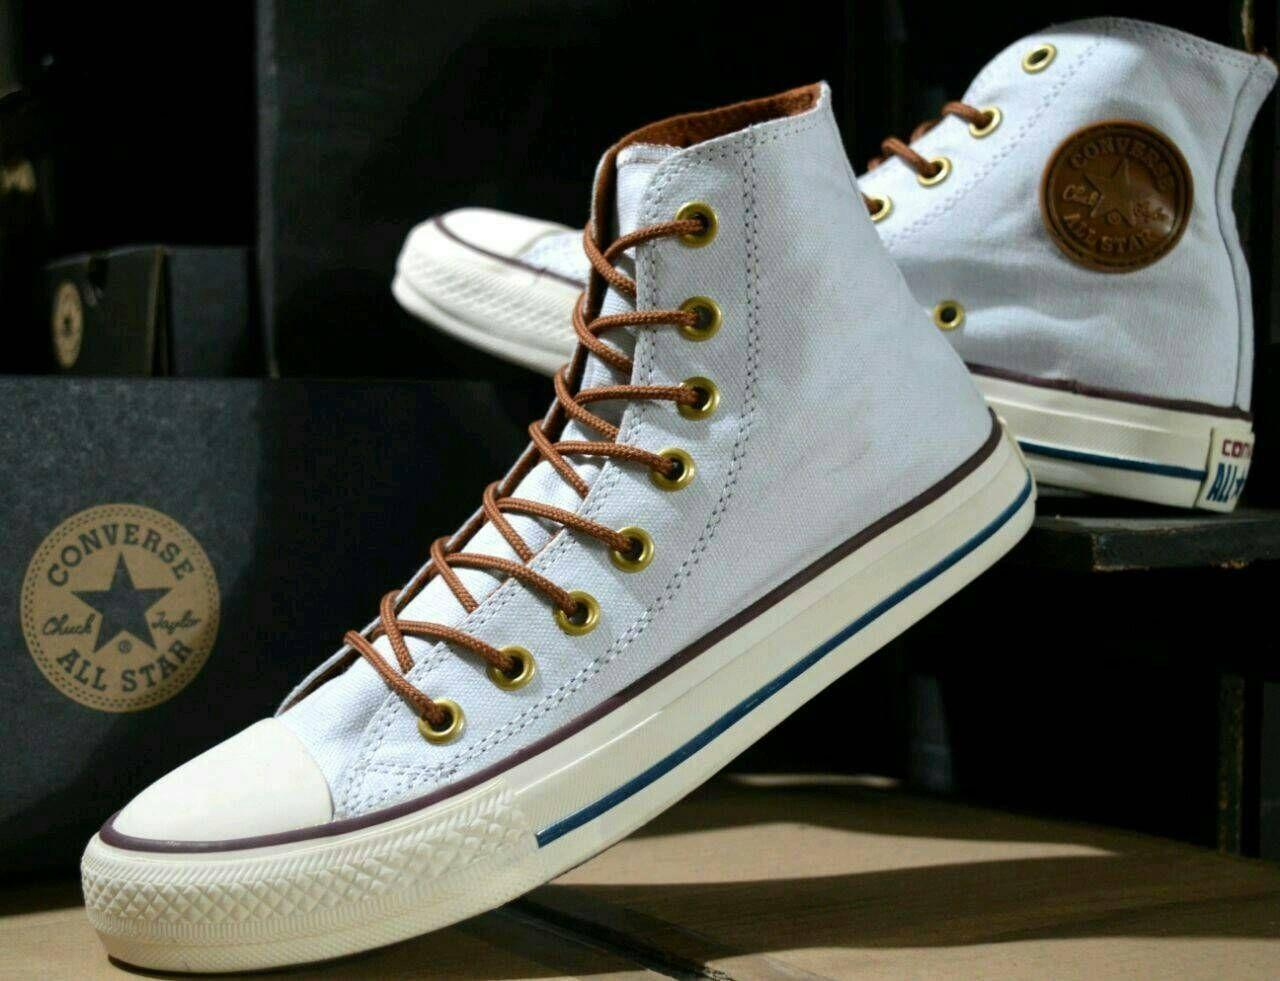 Sepatu Converse Tali Gaya Pria terkini Slip On Pantofel Boots Putih